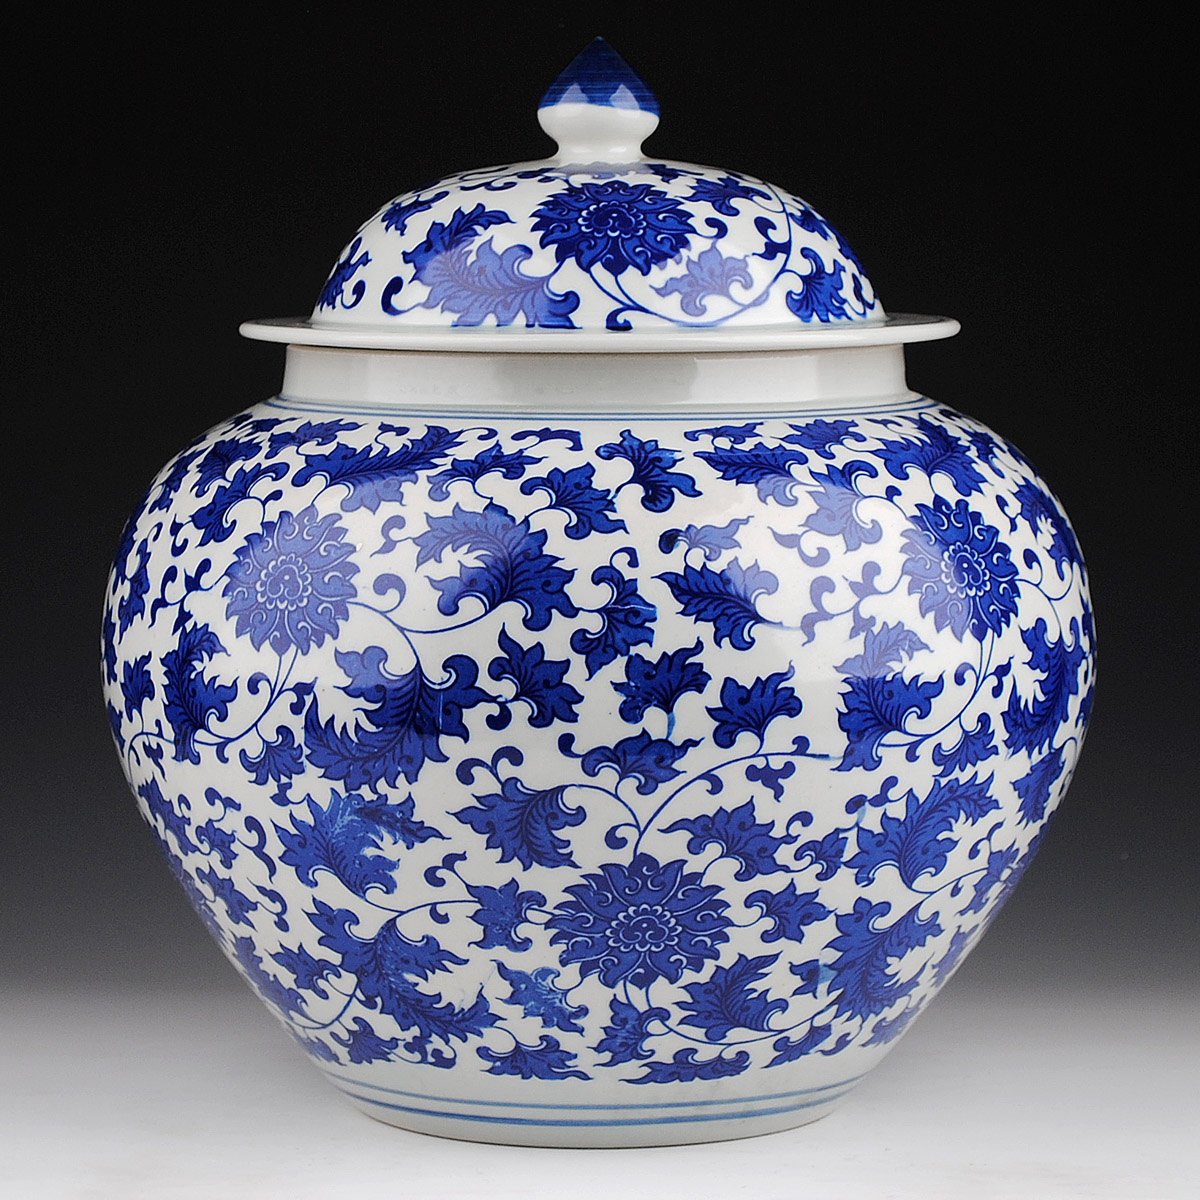 Hongxuan blue and white porcelain lotus general tank storage tank jar jar with cover porcelain altar pickled cabbage